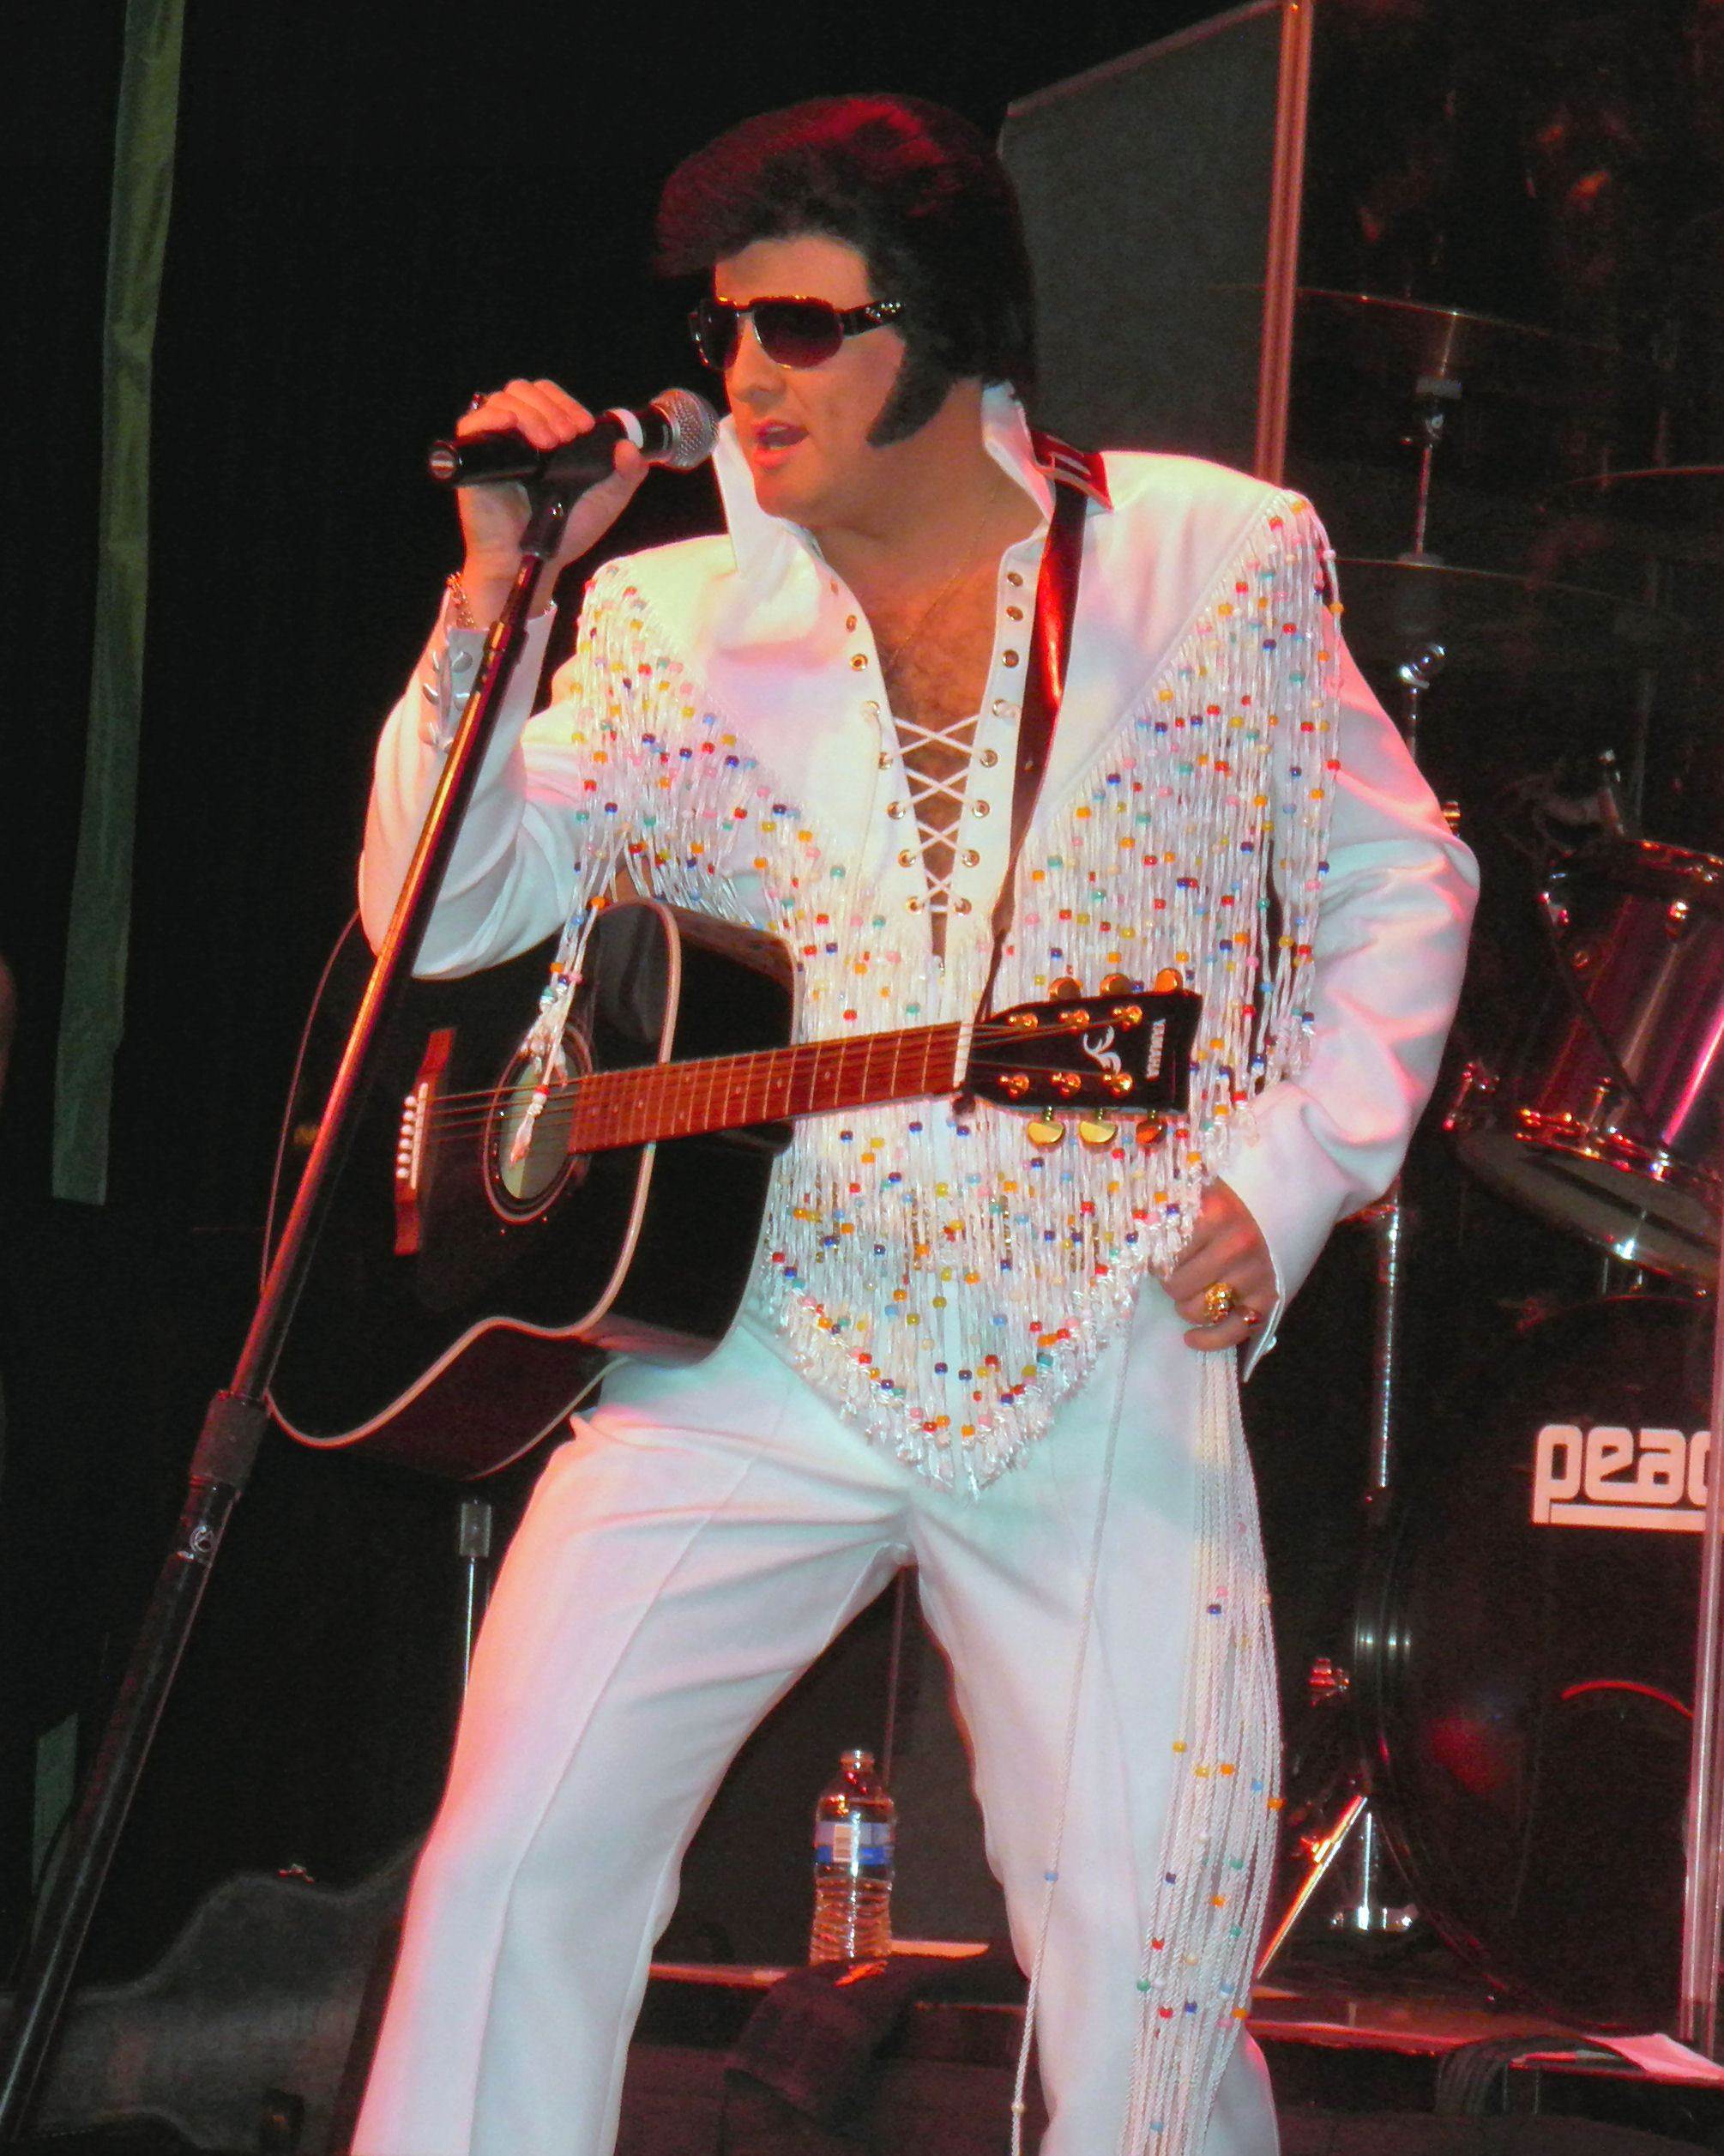 Elvis impersonator + casino windsor international waters gambling age